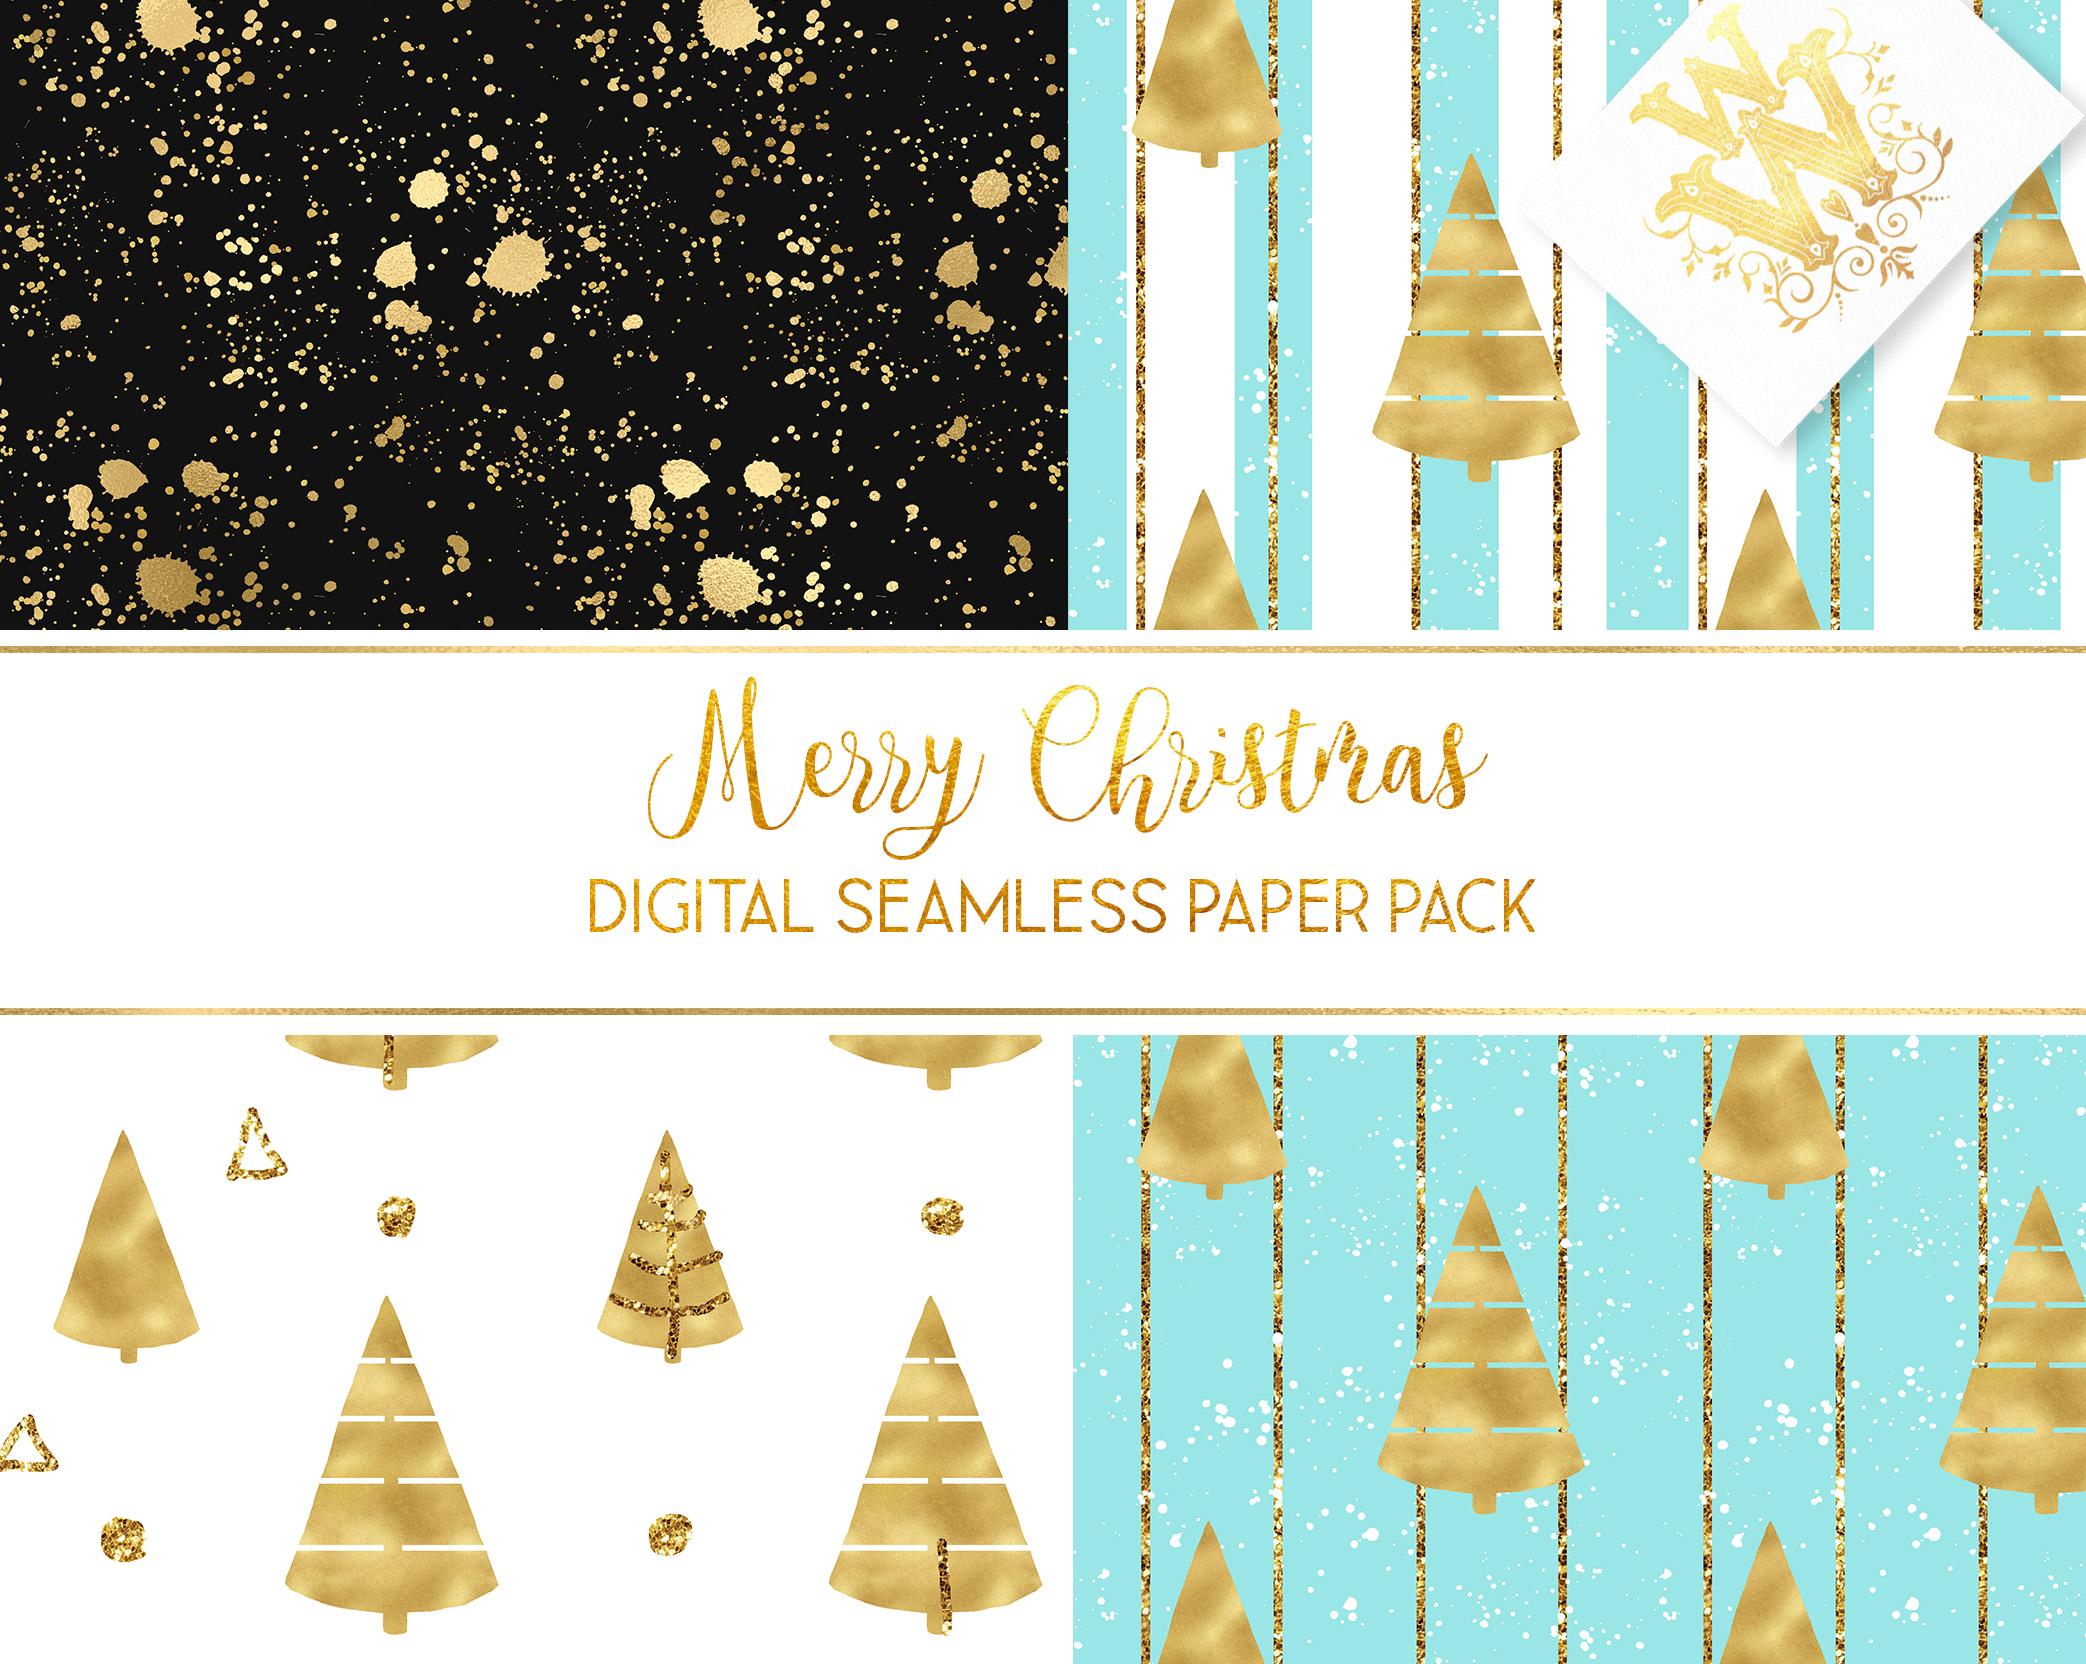 Christmas digital paper pack, seamless pattern snowflake example image 5